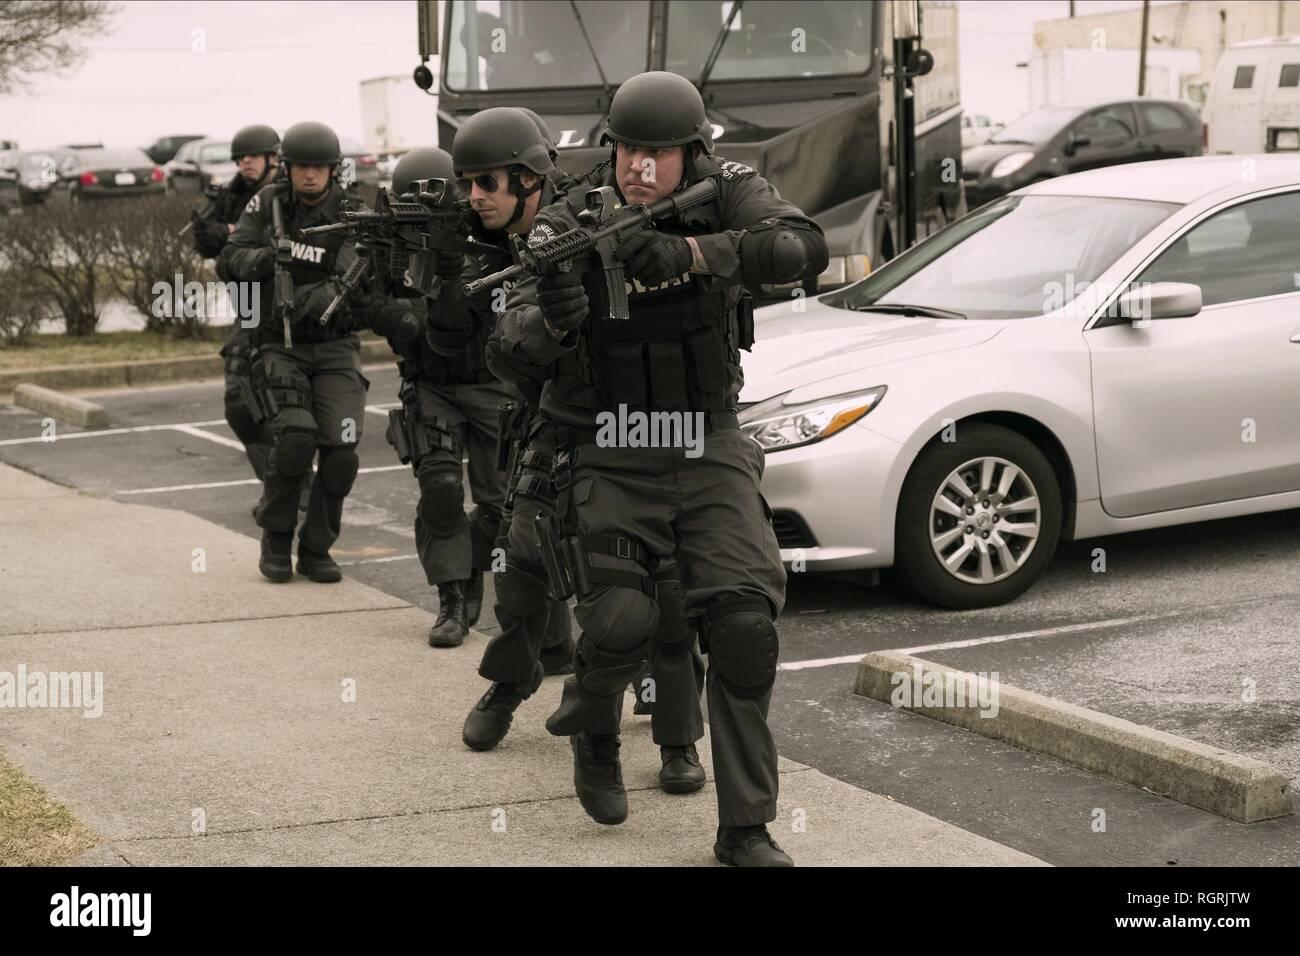 Bewaffneten SWAT TEAM RÄUBERHÖHLE (2018) Stockbild